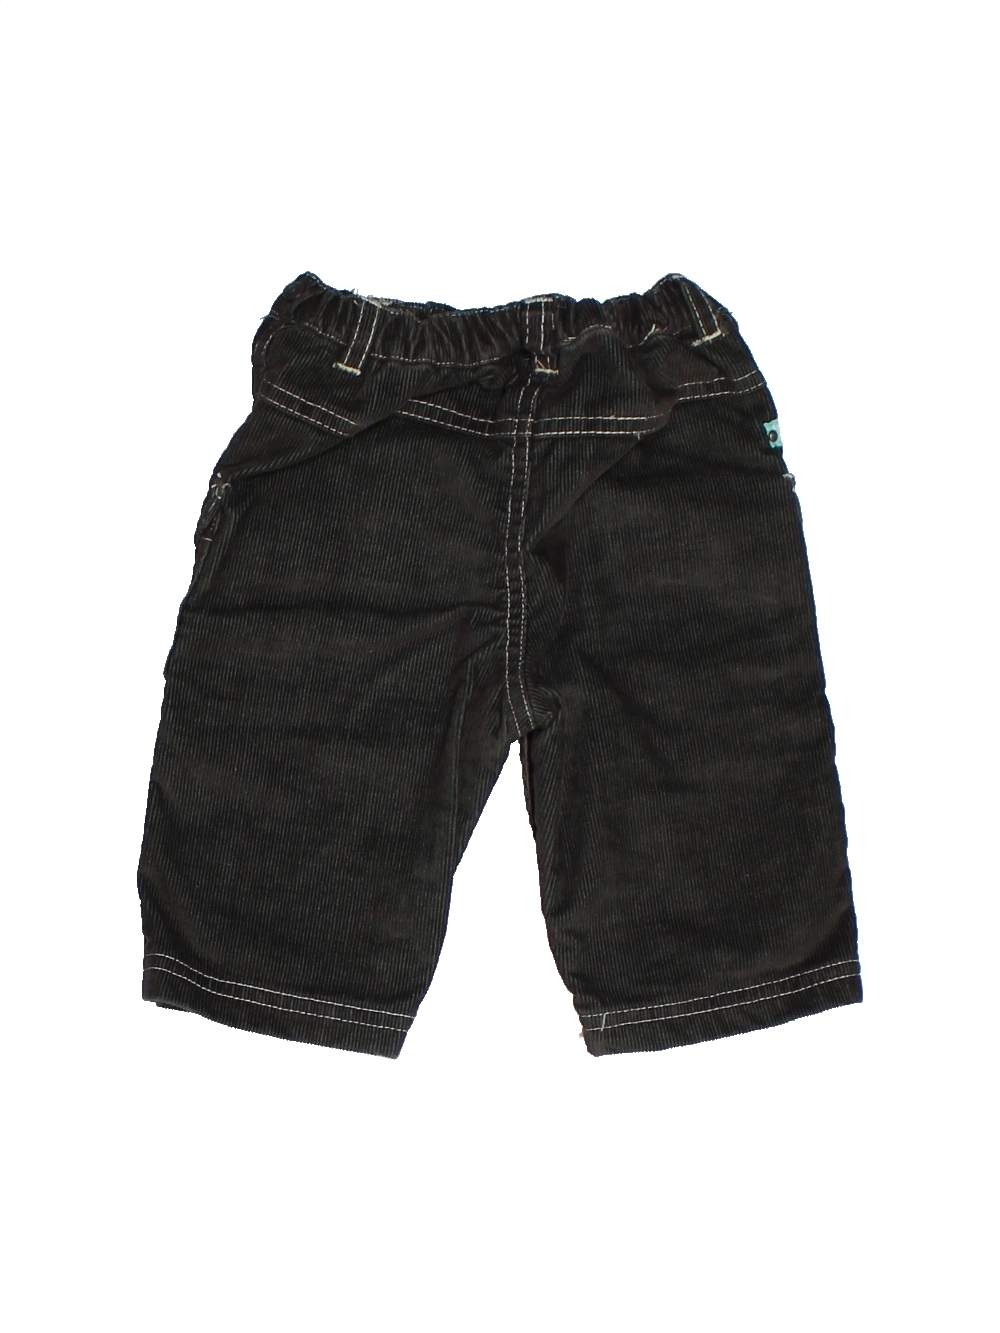 Pantalon-bA-bA-garA-on-SERGENT-MAJOR-3-mois-bleu-foncA-hiver-vA-tement-bA-bA